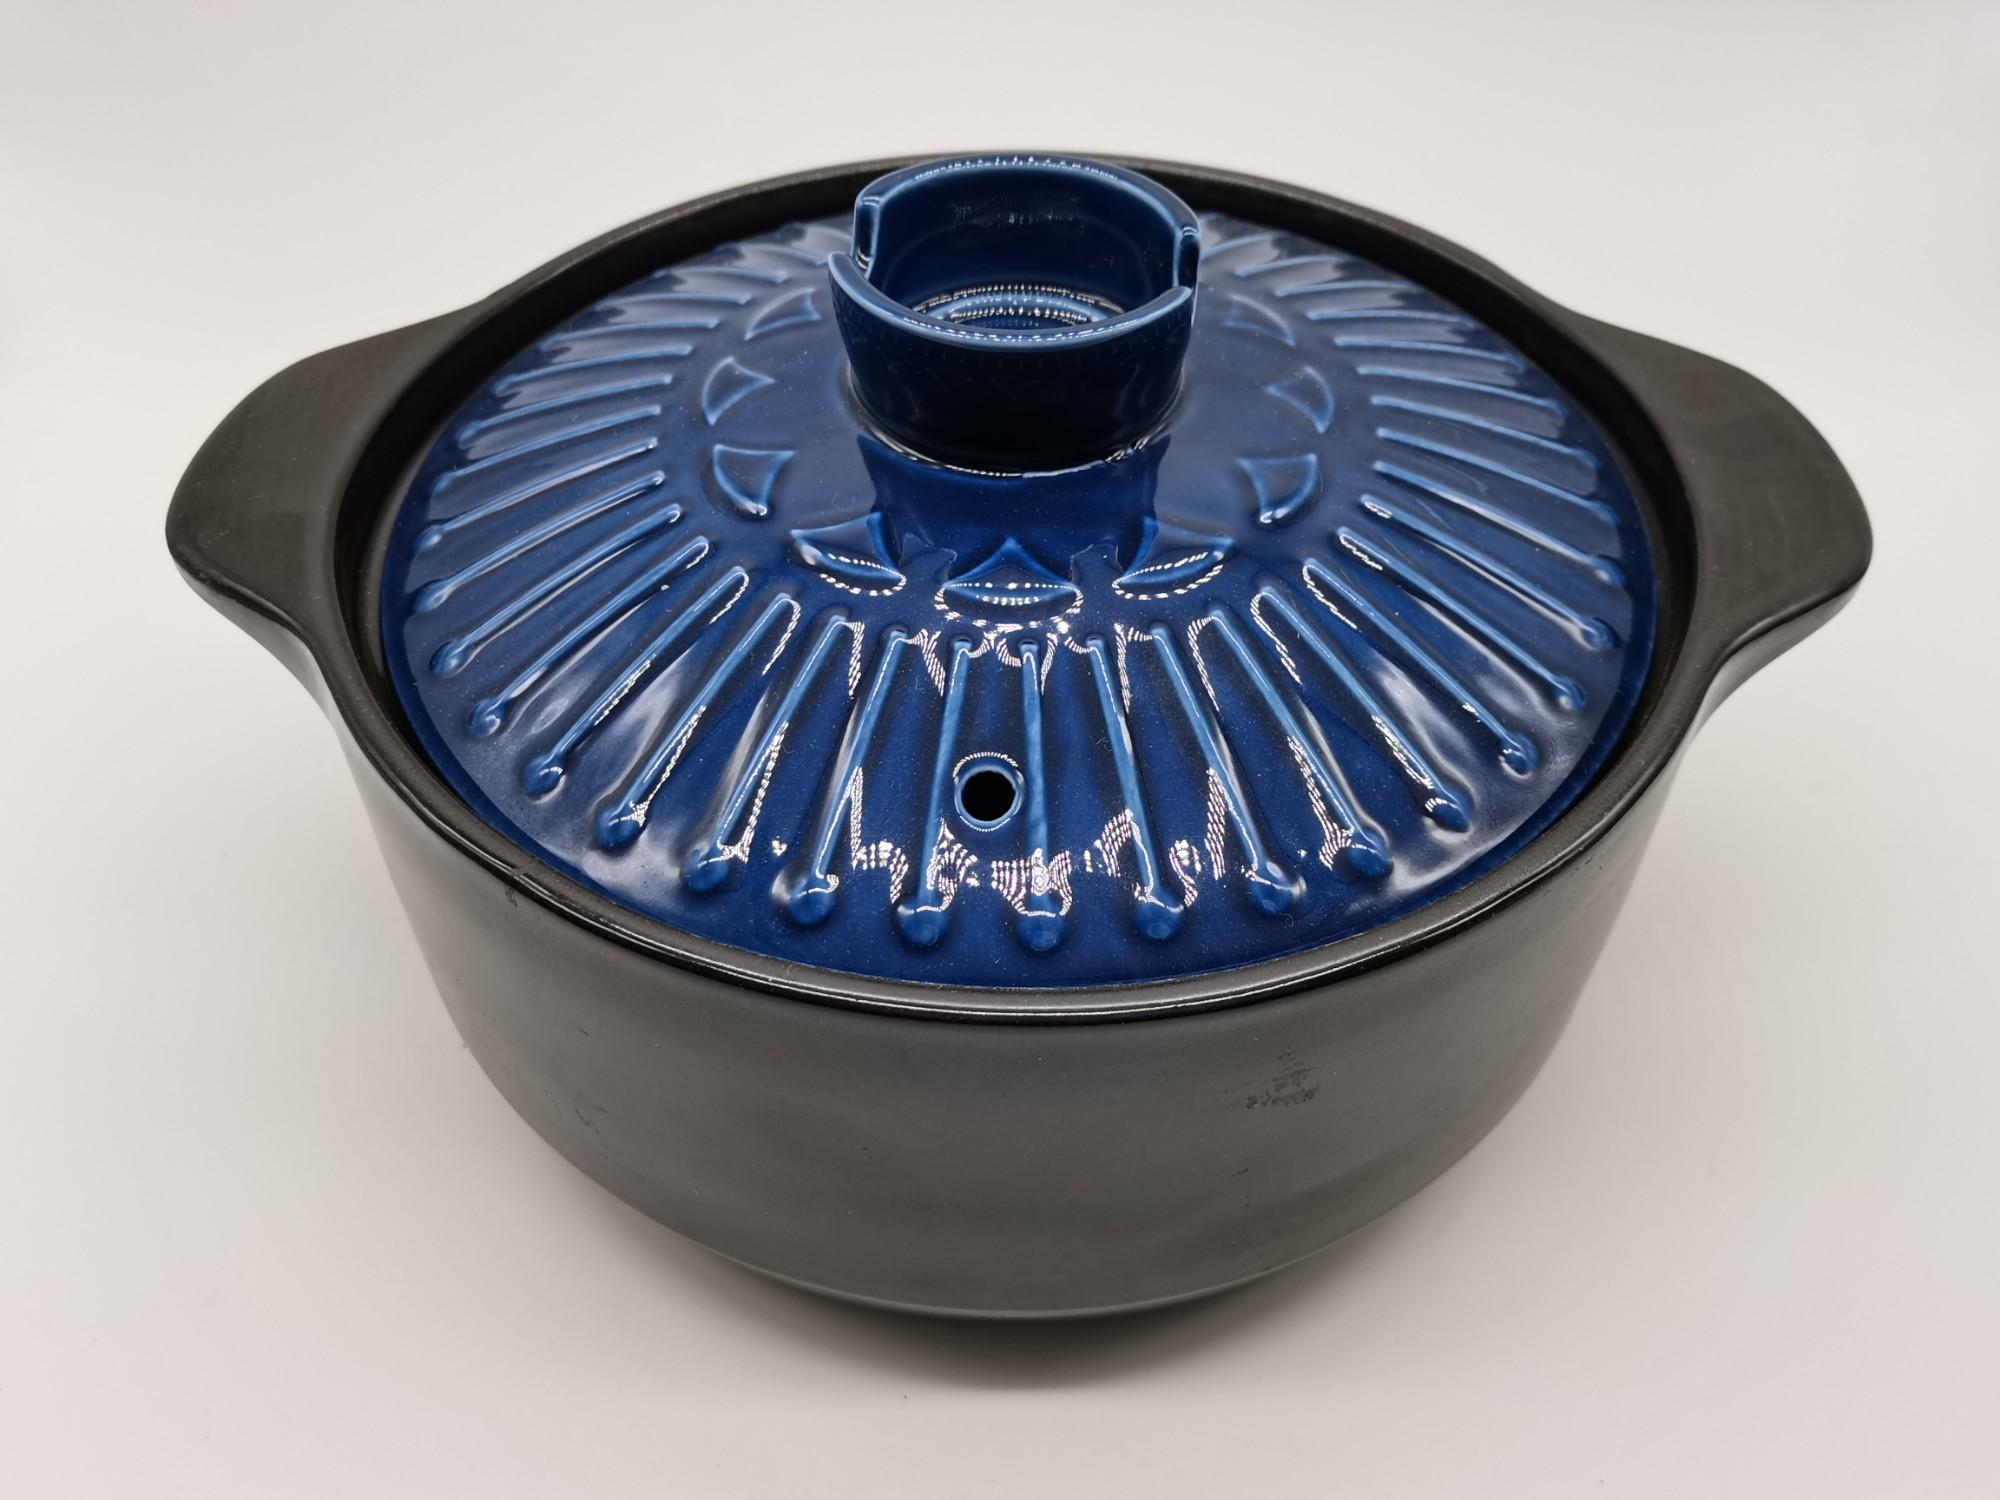 Heat Resistant Ceramic Casserole With Lid